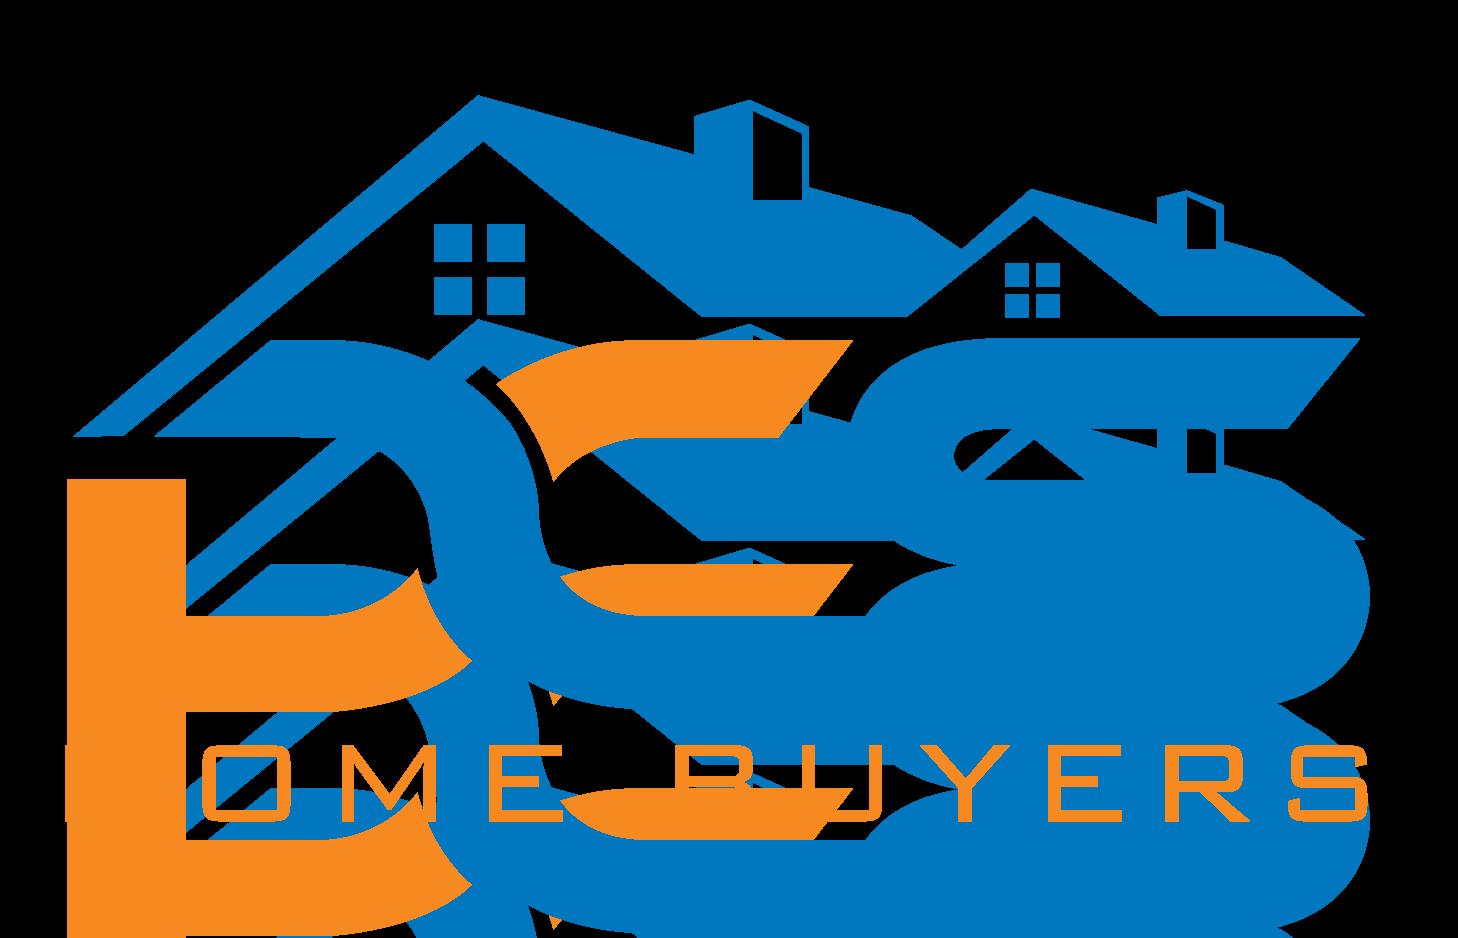 DCS Home Buyers LLC  logo